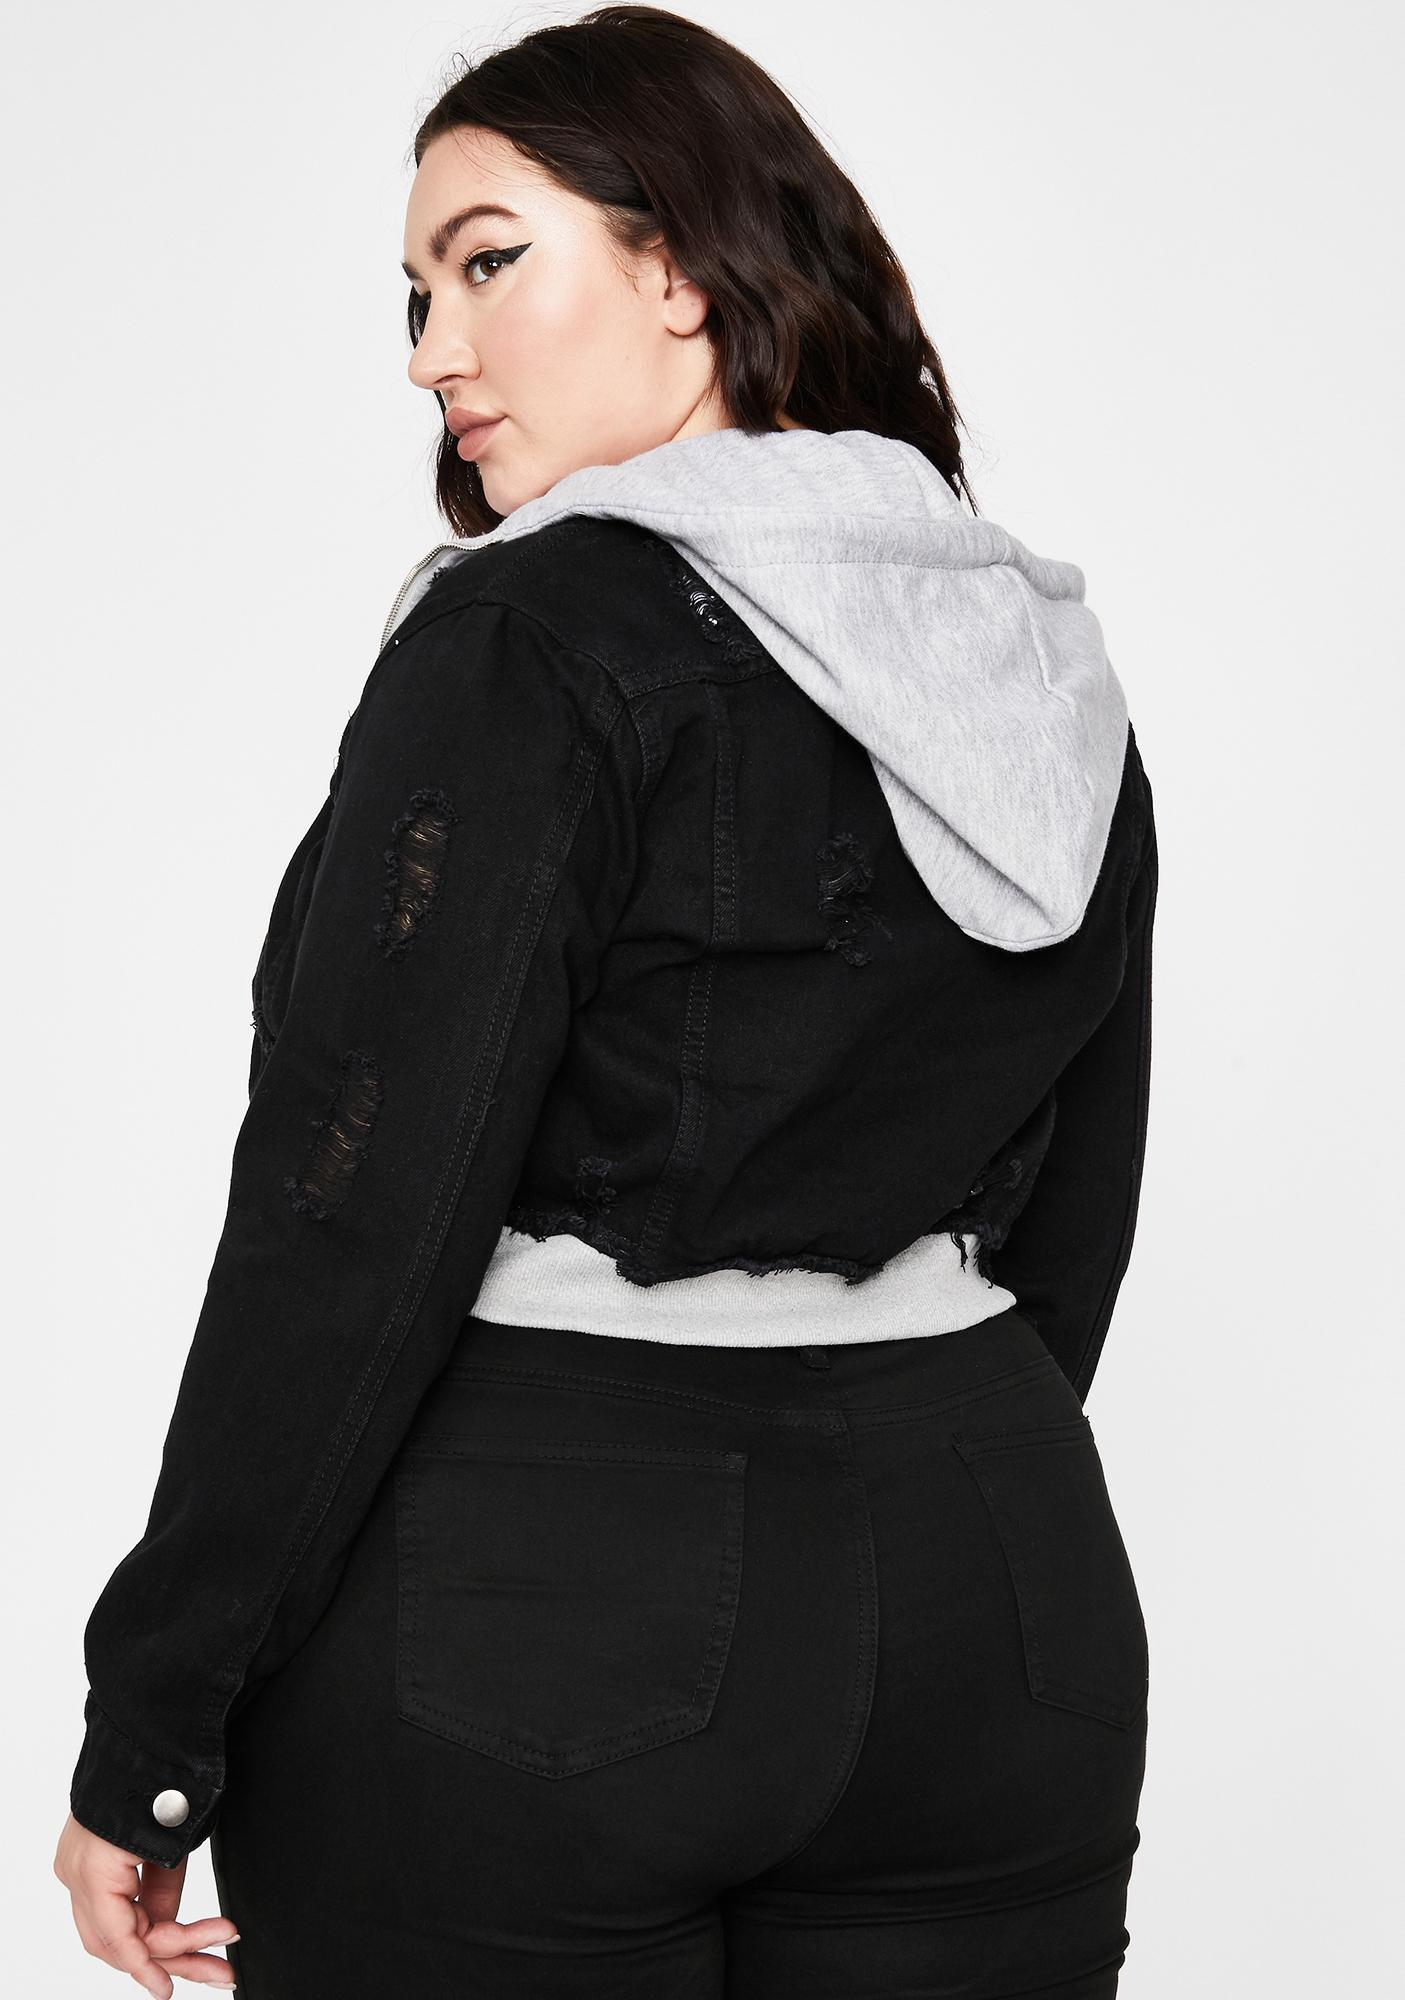 So Bad Give Me Chills Denim Jacket